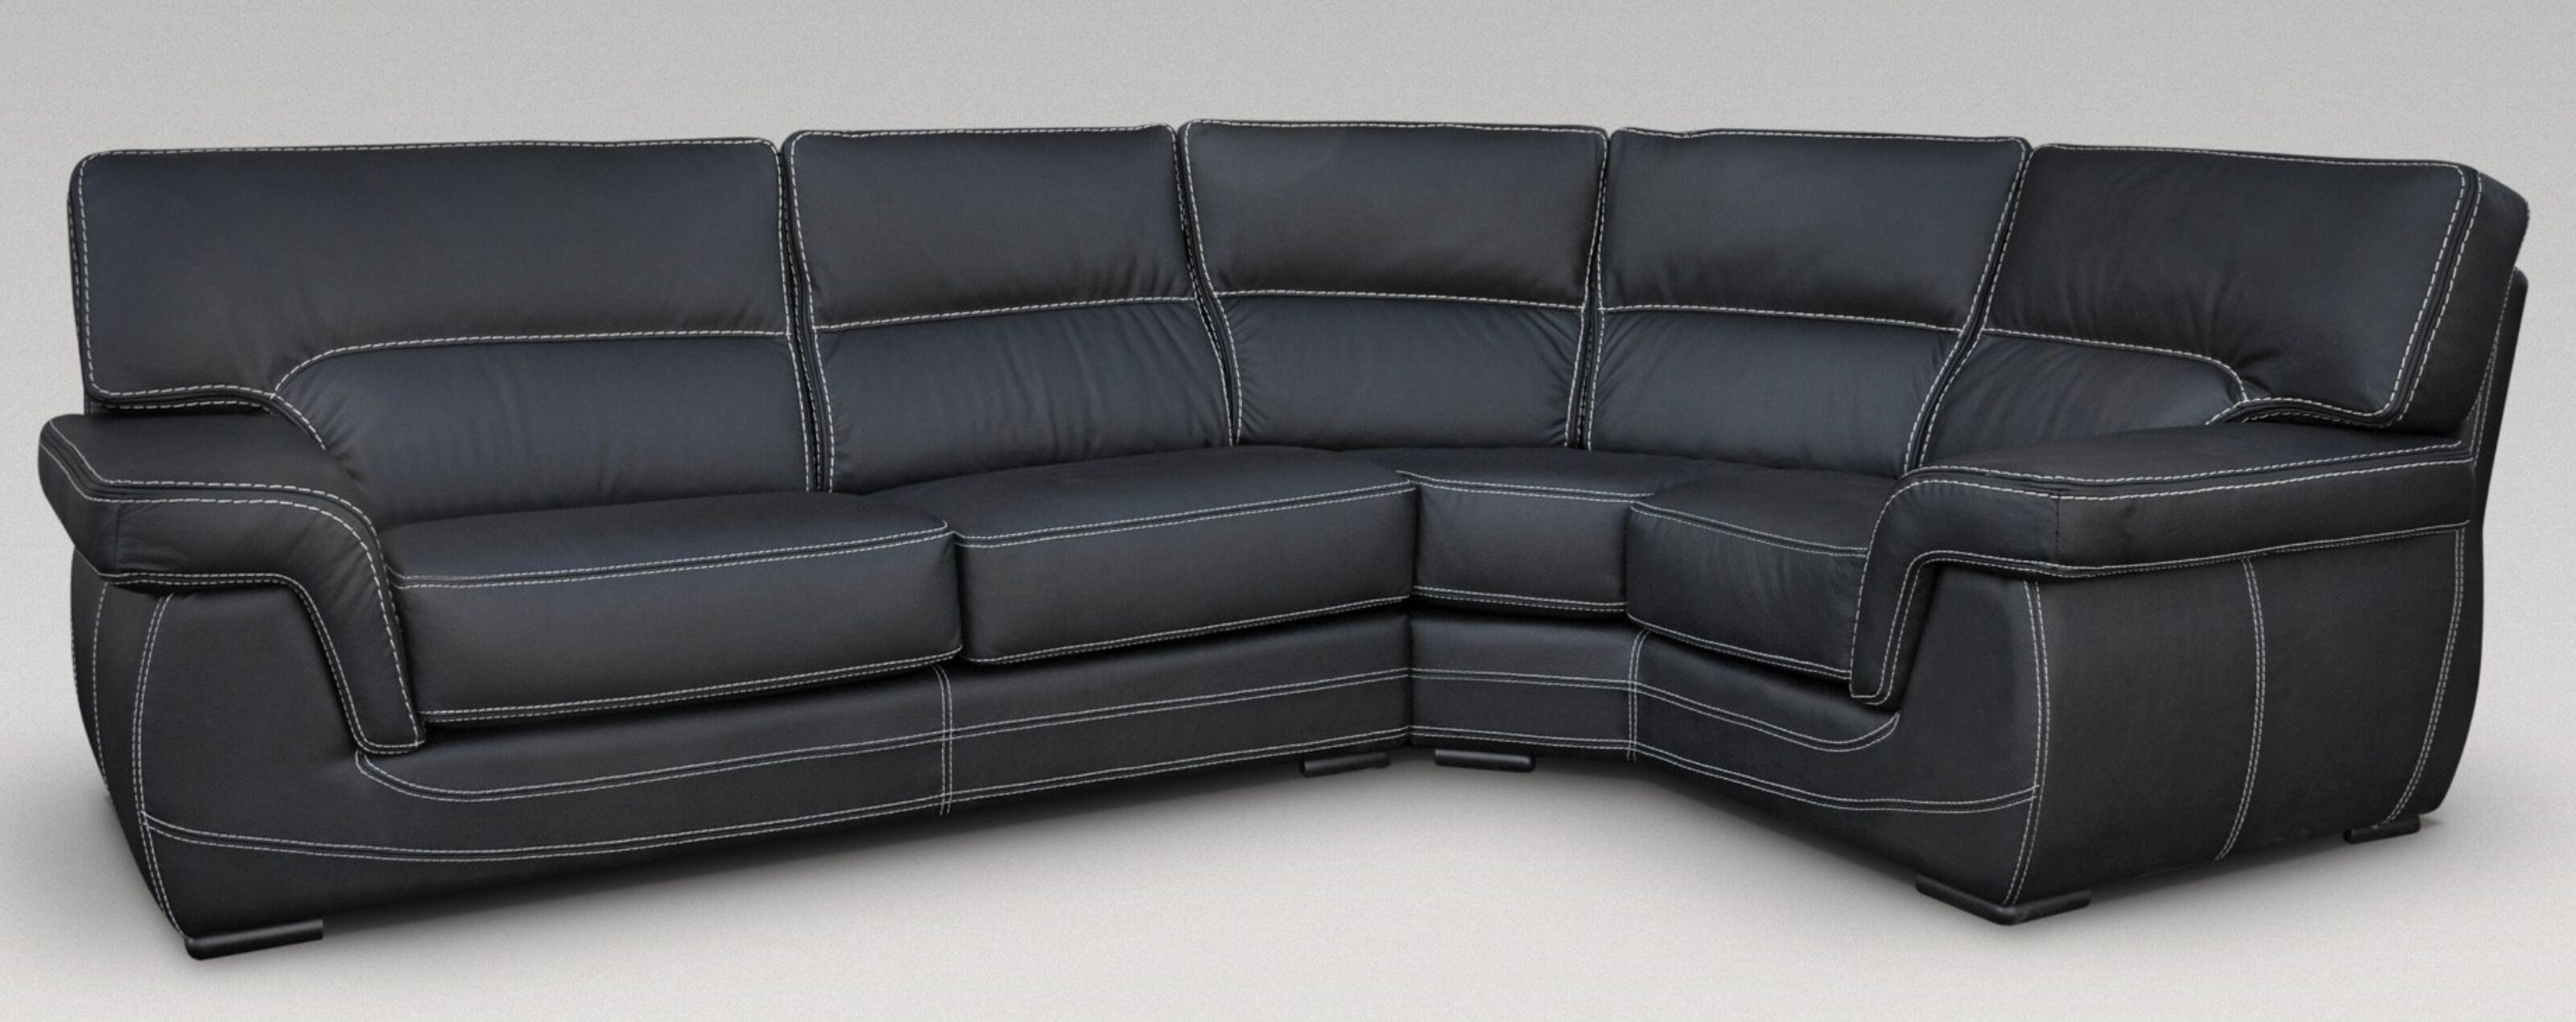 babylon 3 corner 1 genuine italian black leather corner sofa group suite offer